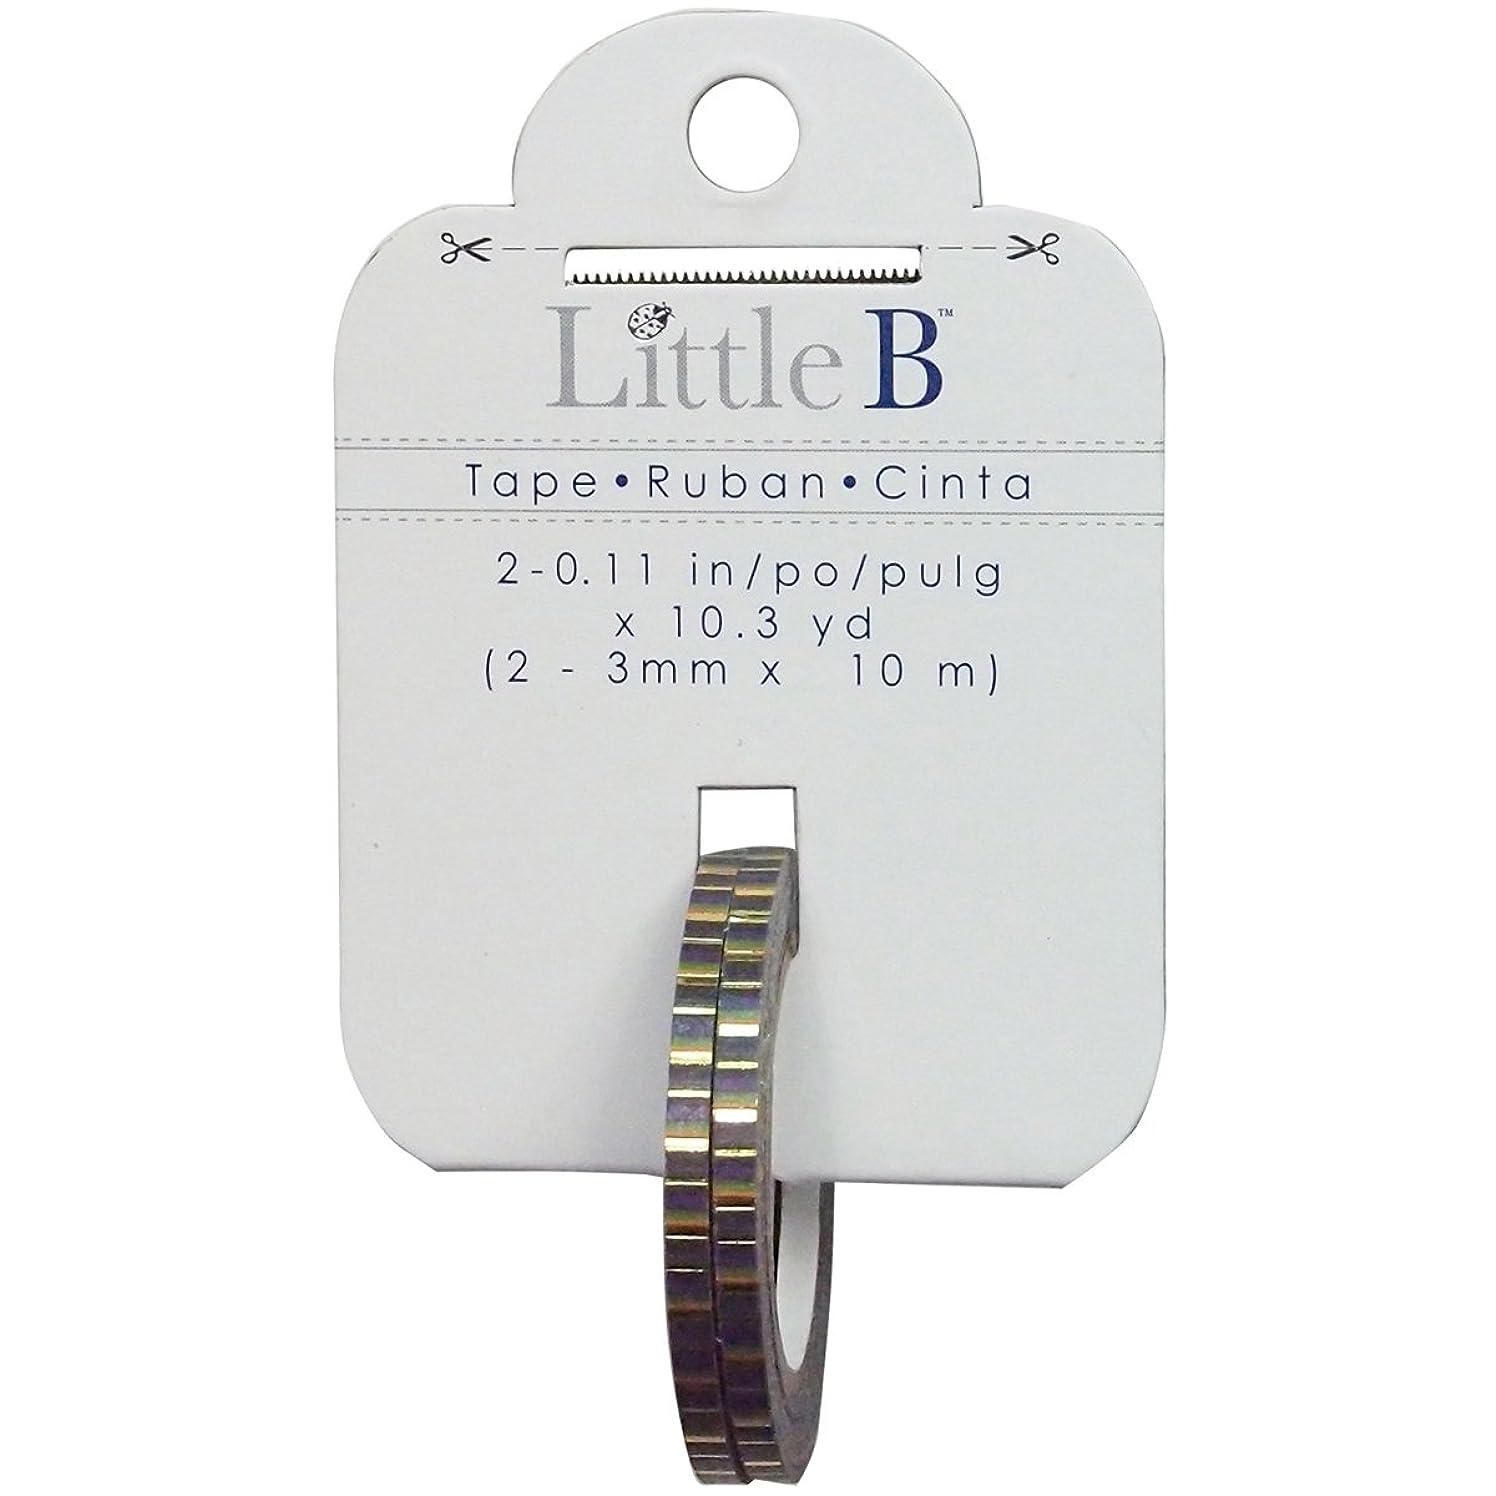 Little B 100776 Decorative Foil Paper Tape, Halloween Stripes with Gold Foil